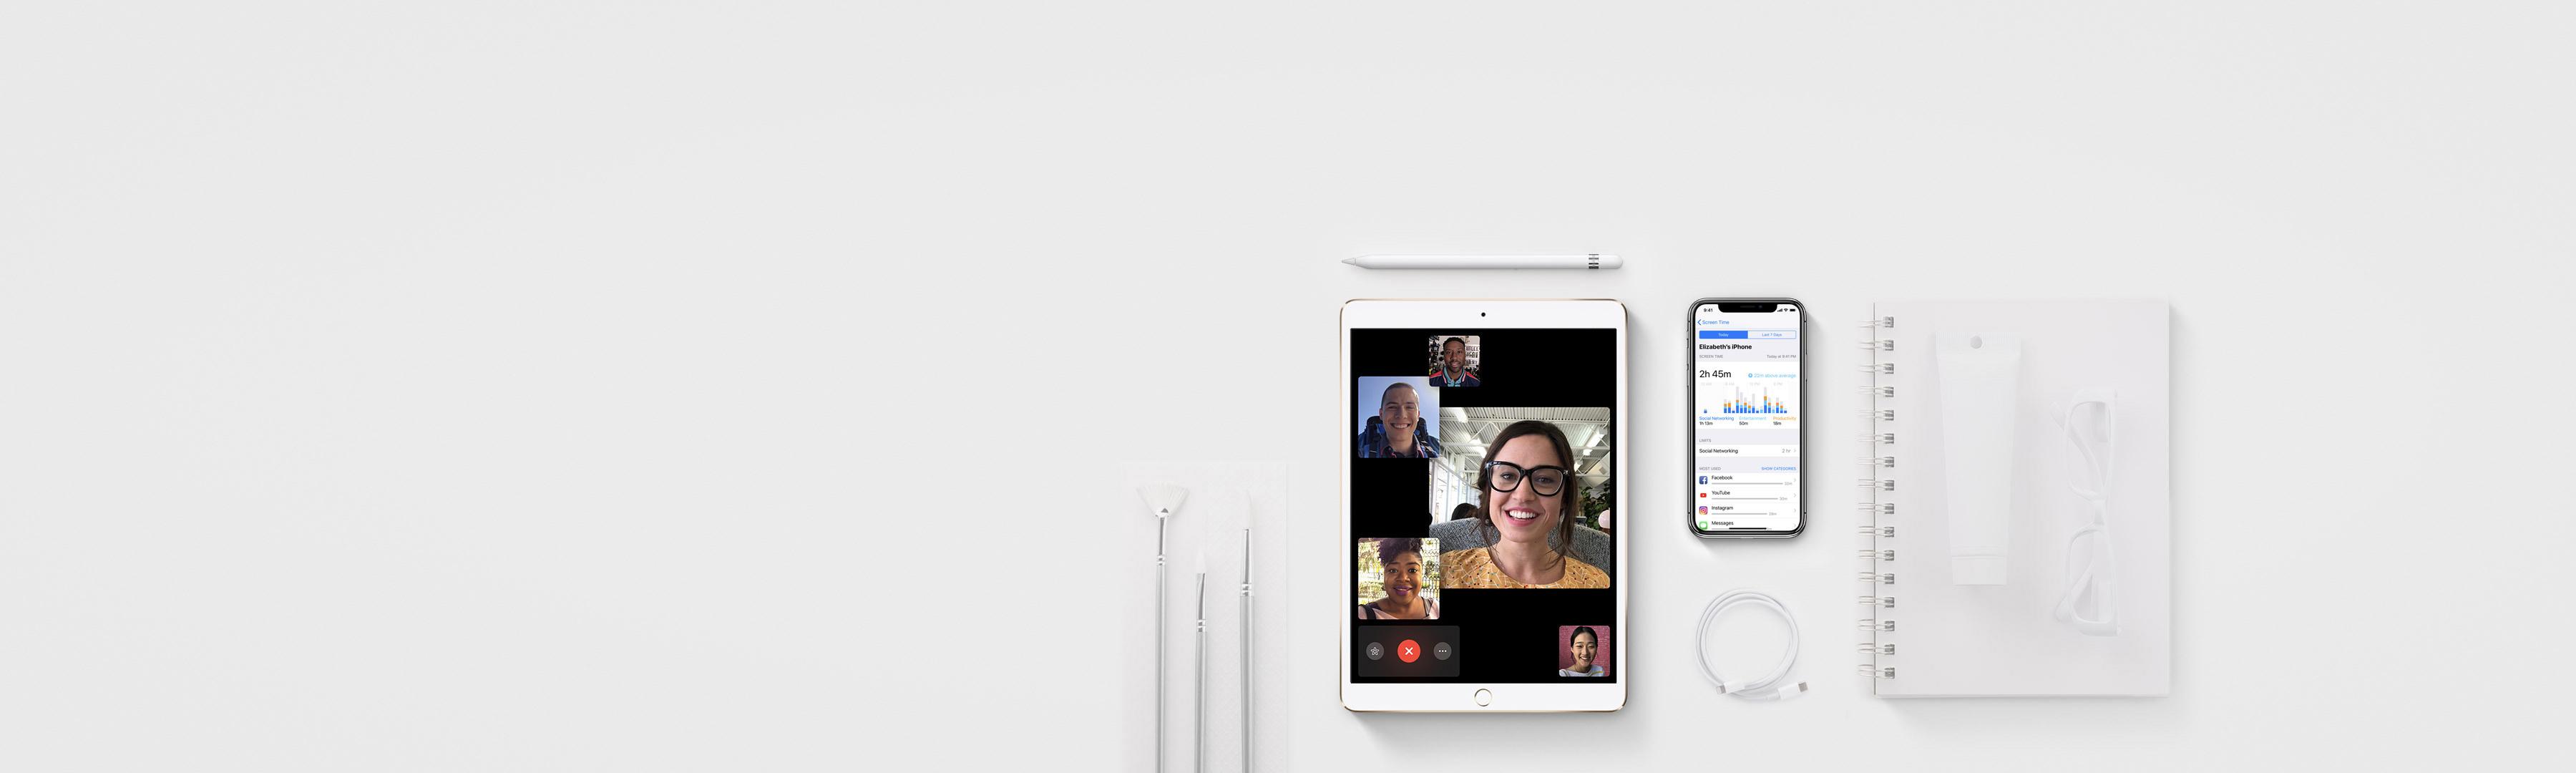 Iphone 4s Bedienungsanleitung Pdf